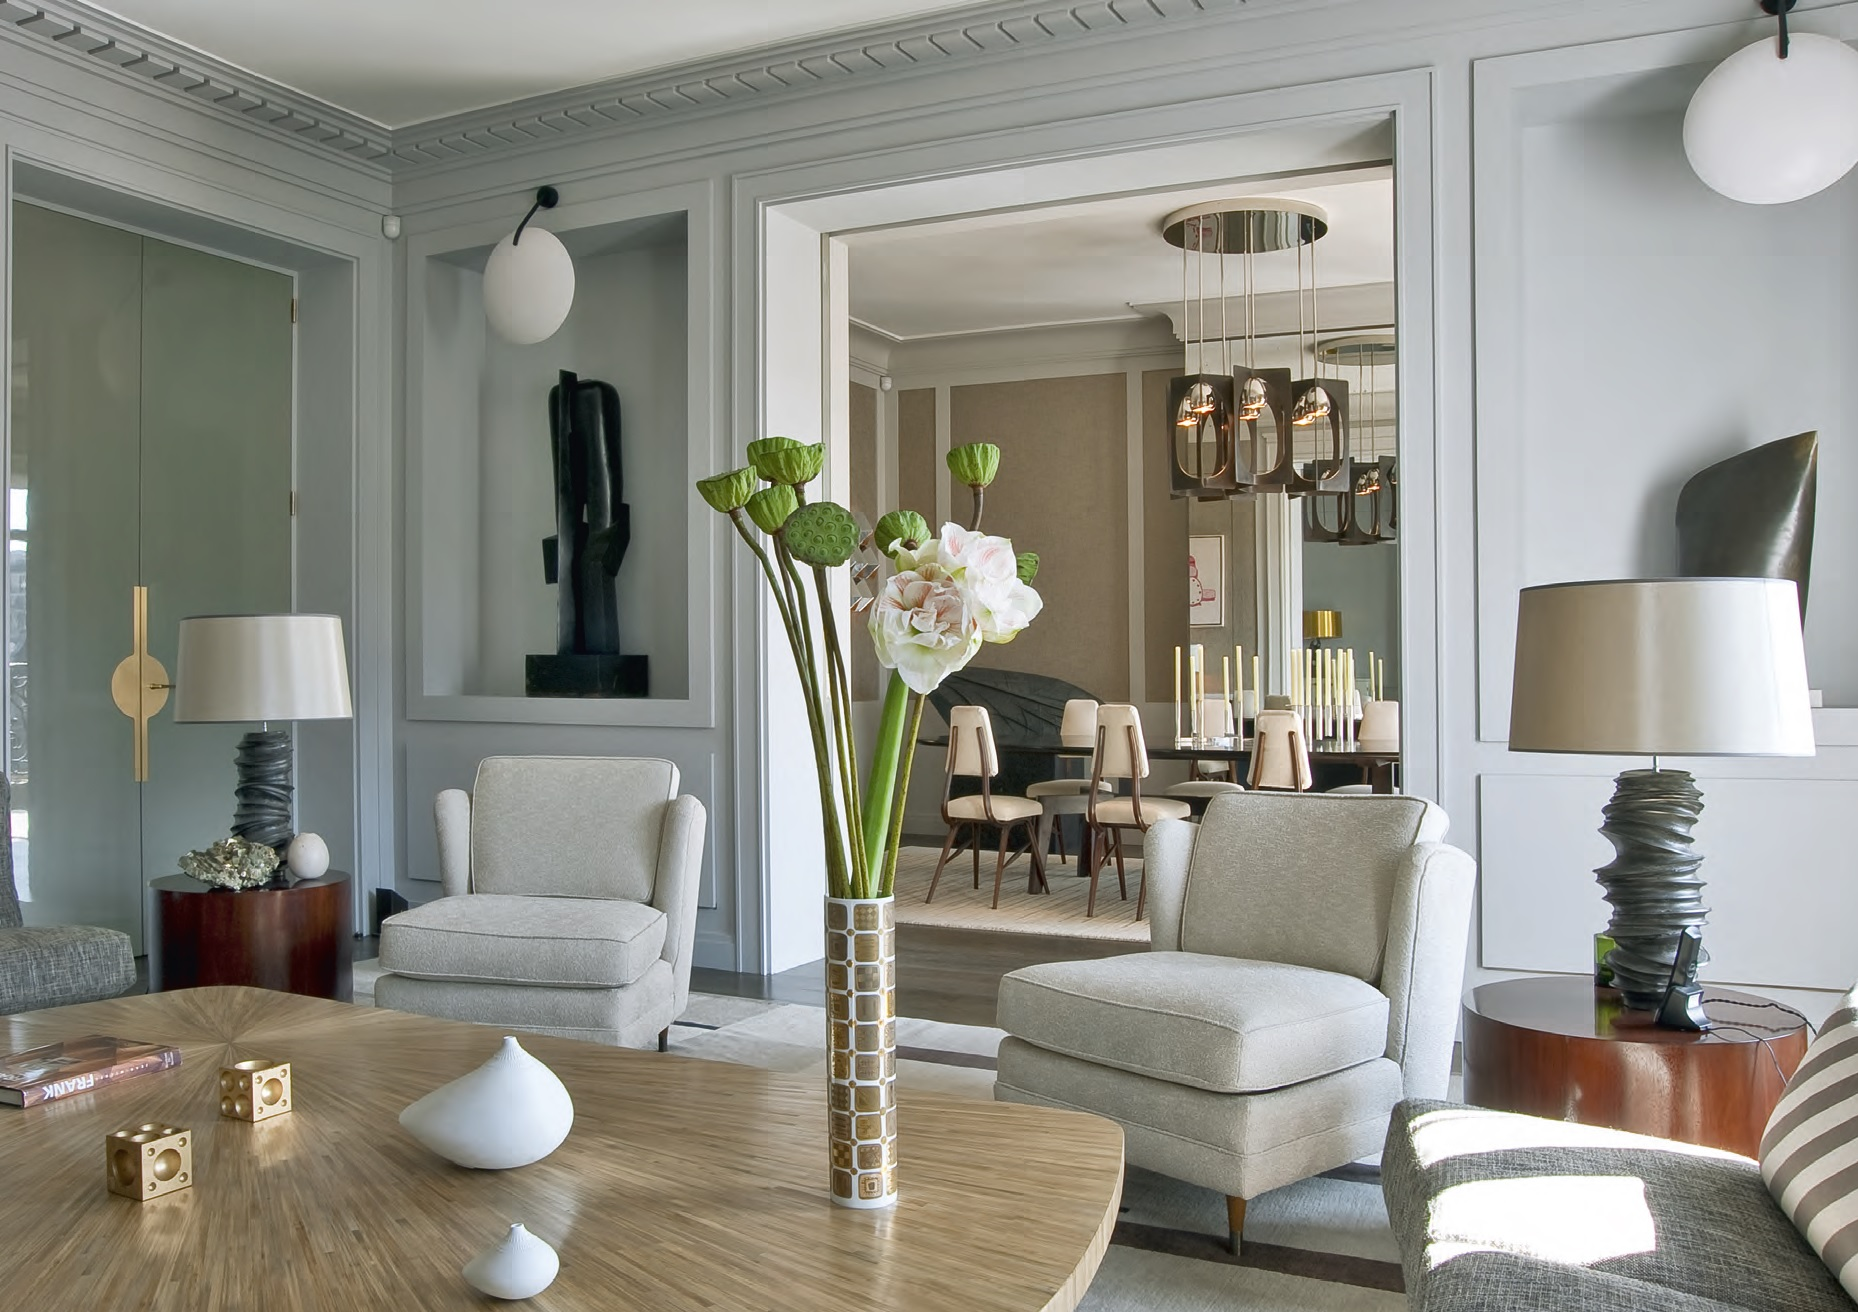 Ristrutturare ed arredare una casa best free home - Ristrutturare e arredare casa ...